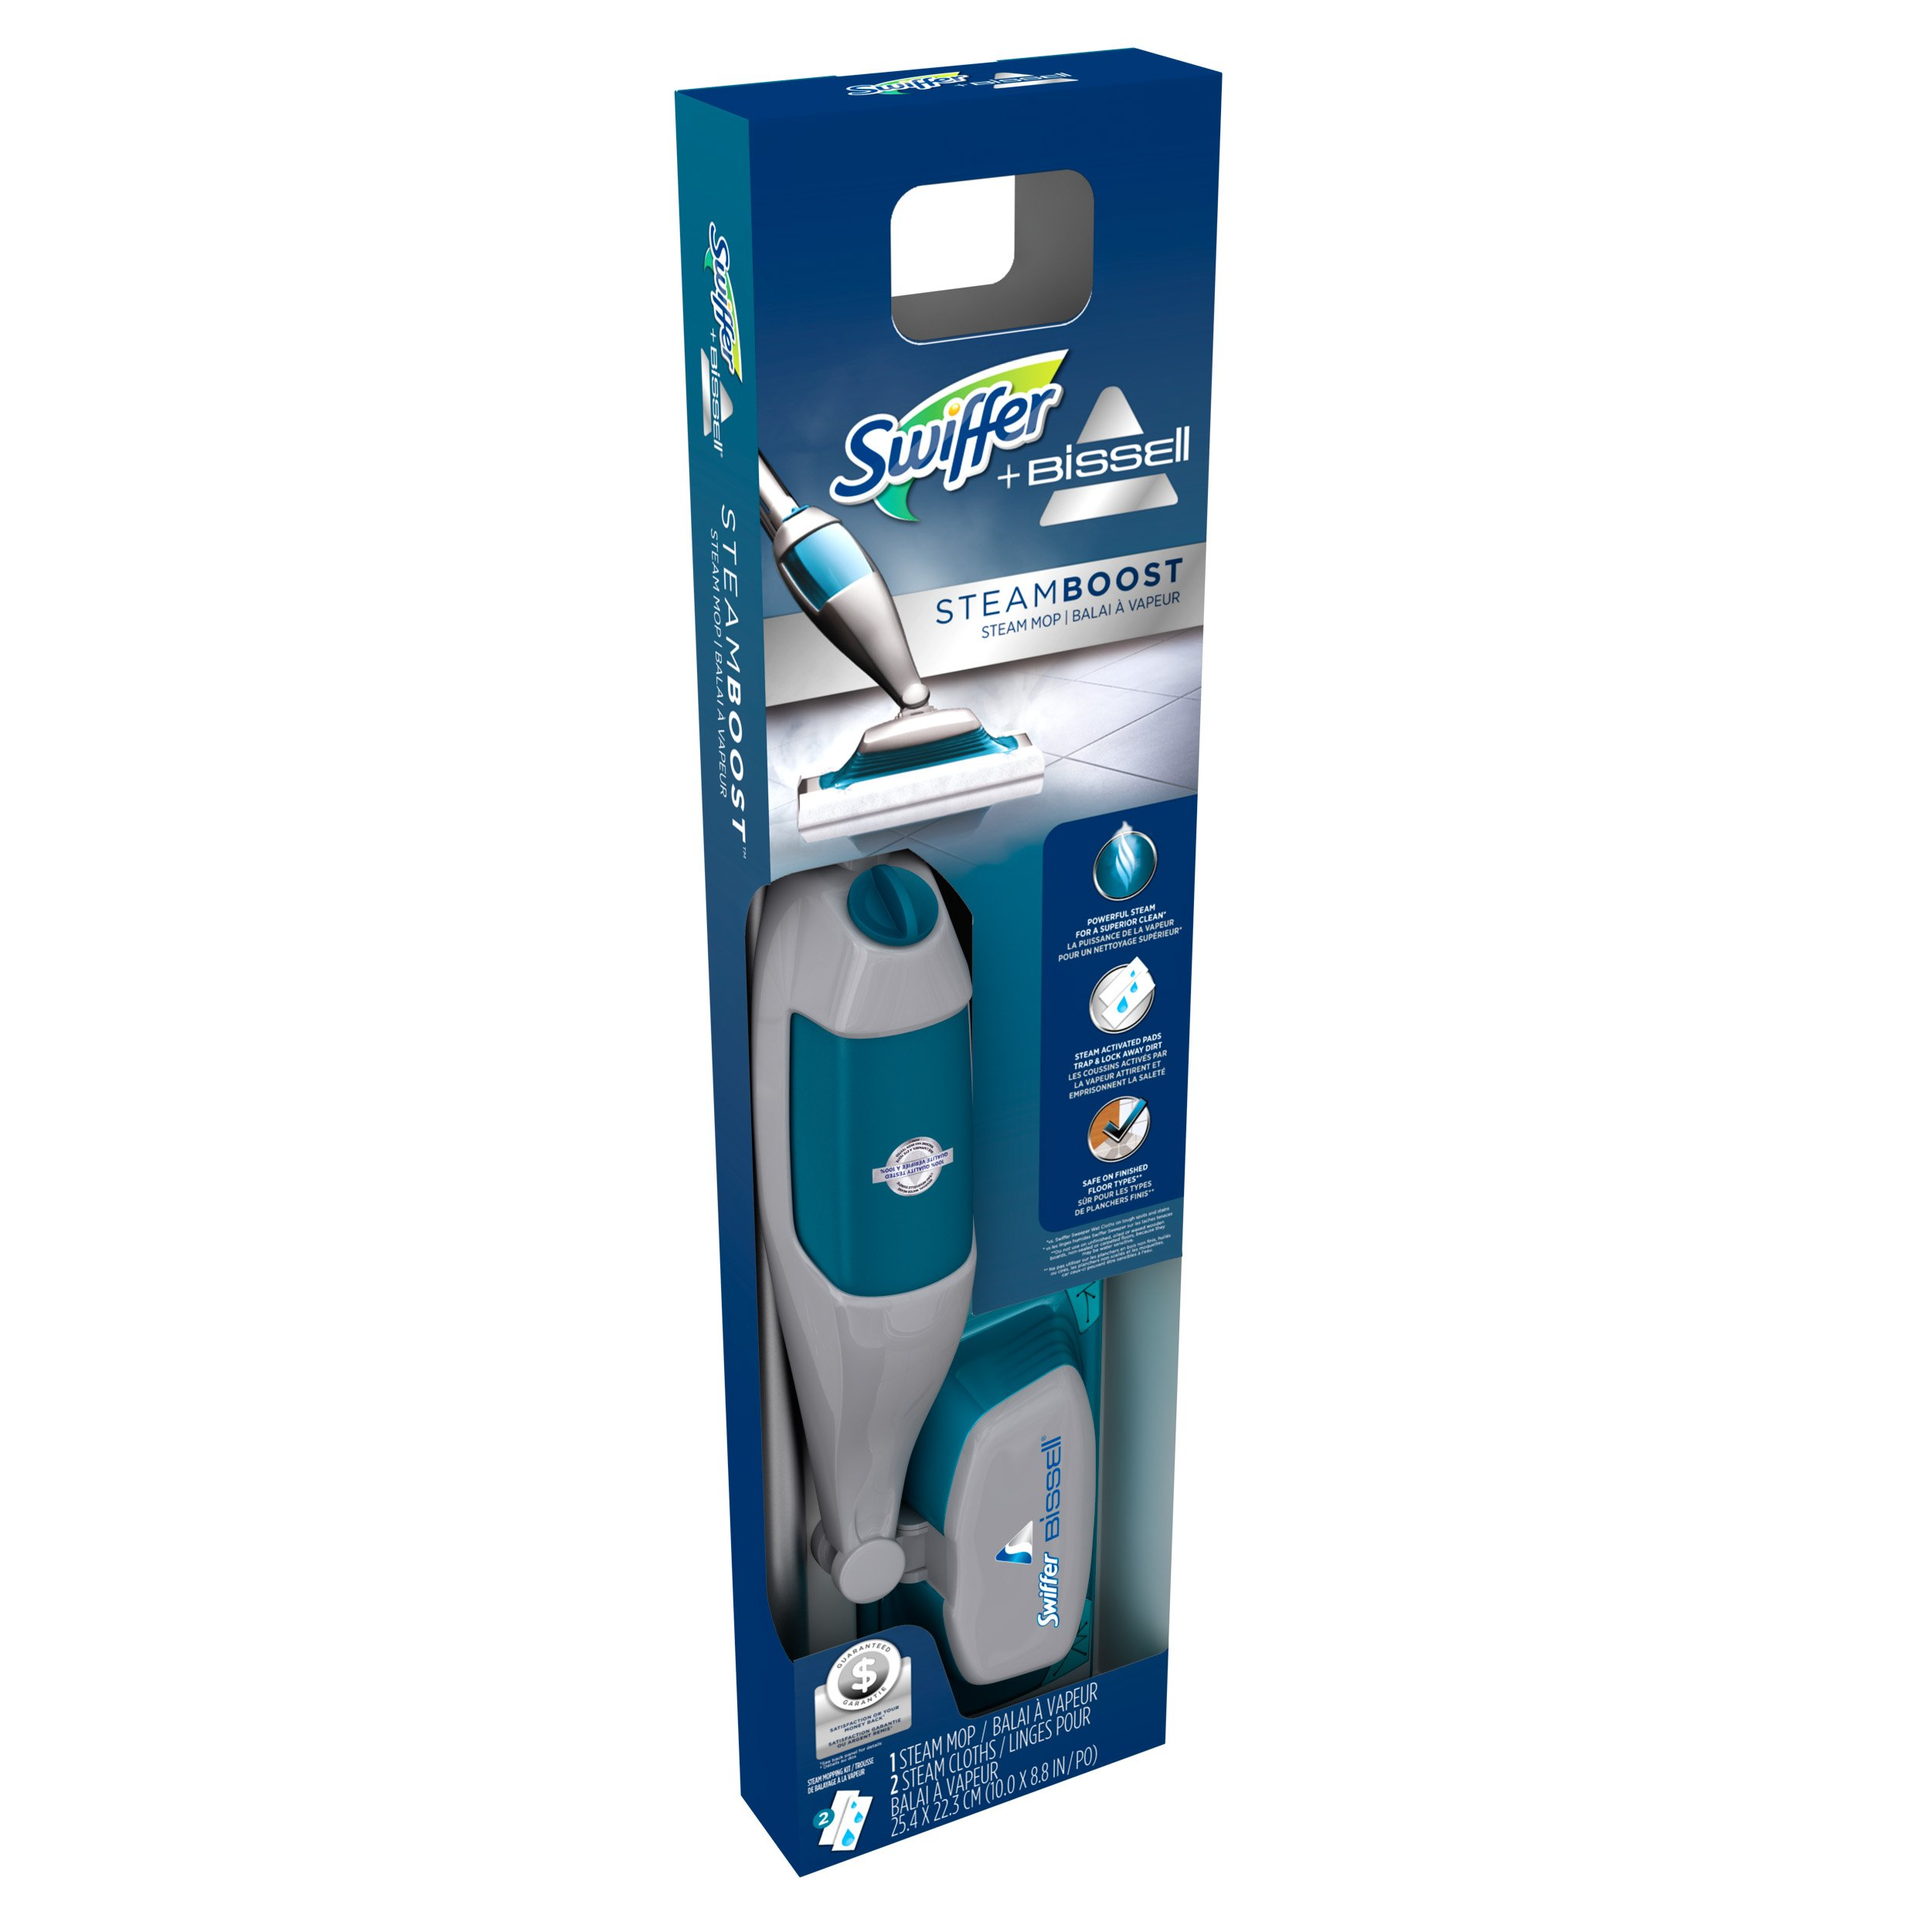 swiffer steamboost powered by bissell steam mop starter kit shop